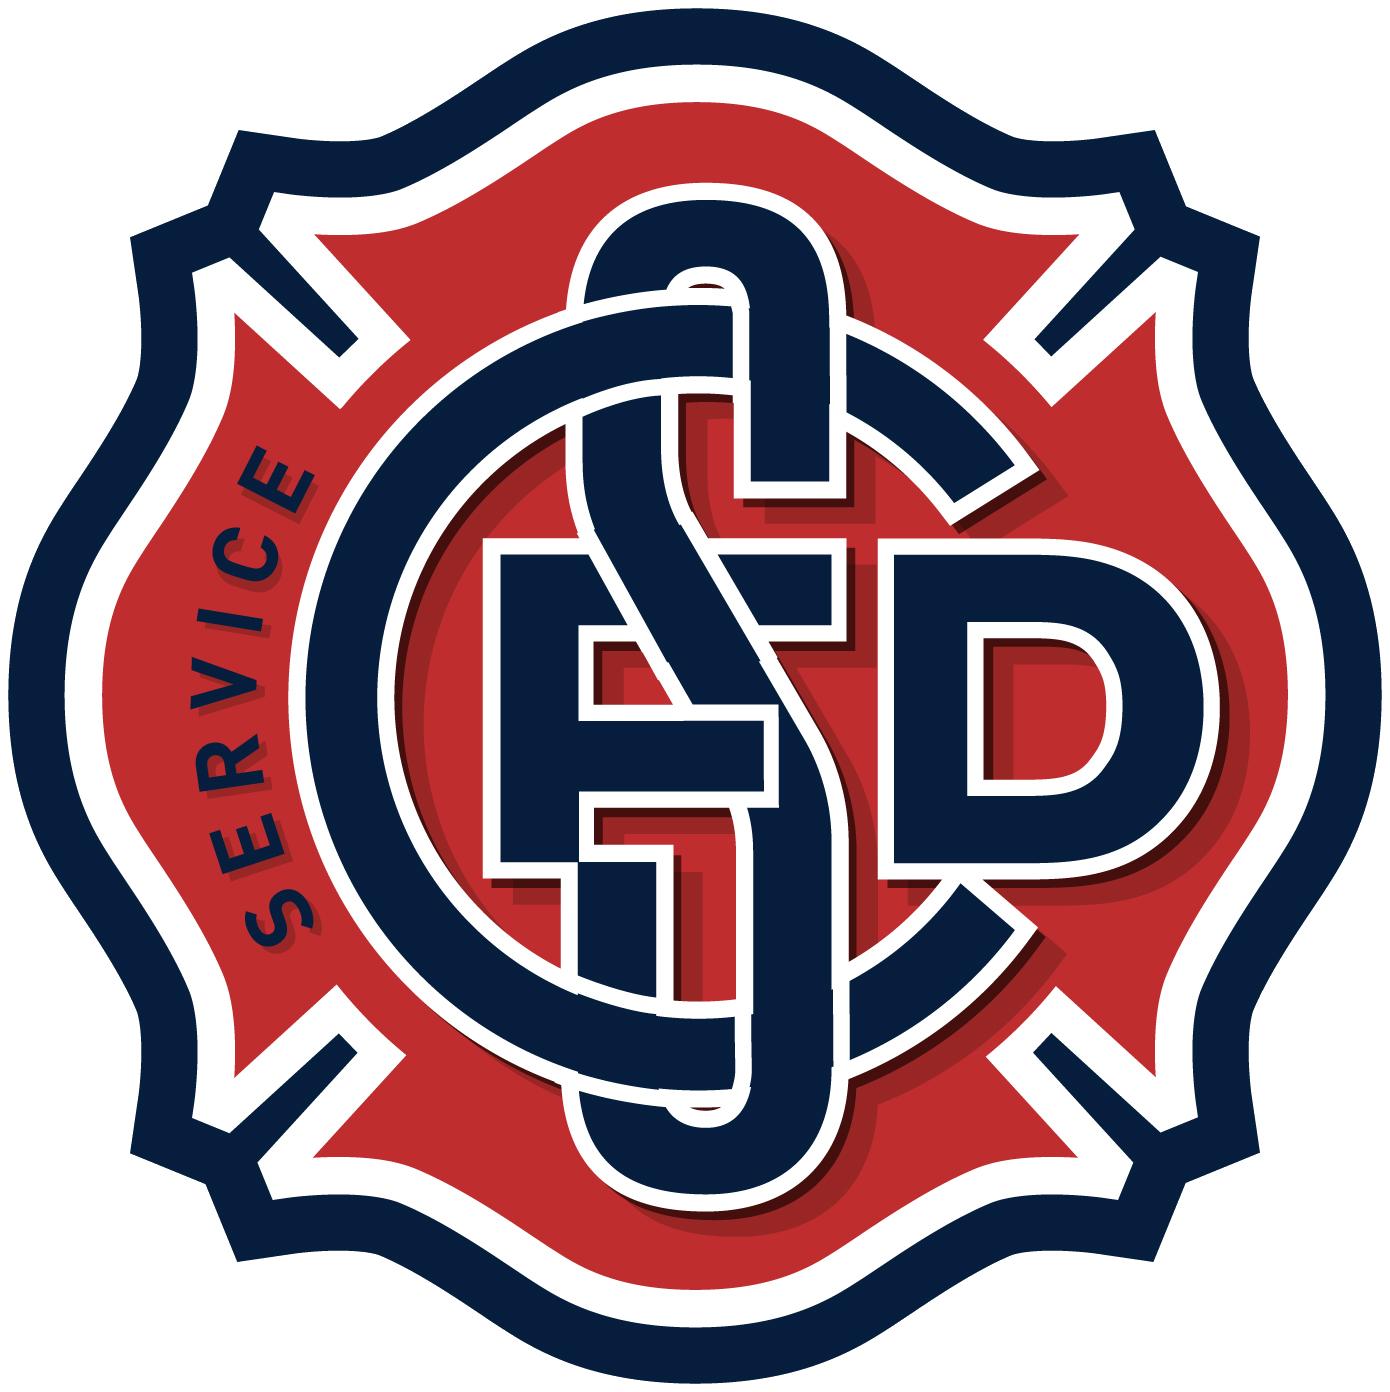 Firehouse dog clipart svg transparent download Silver Creek Fire Department - Home svg transparent download